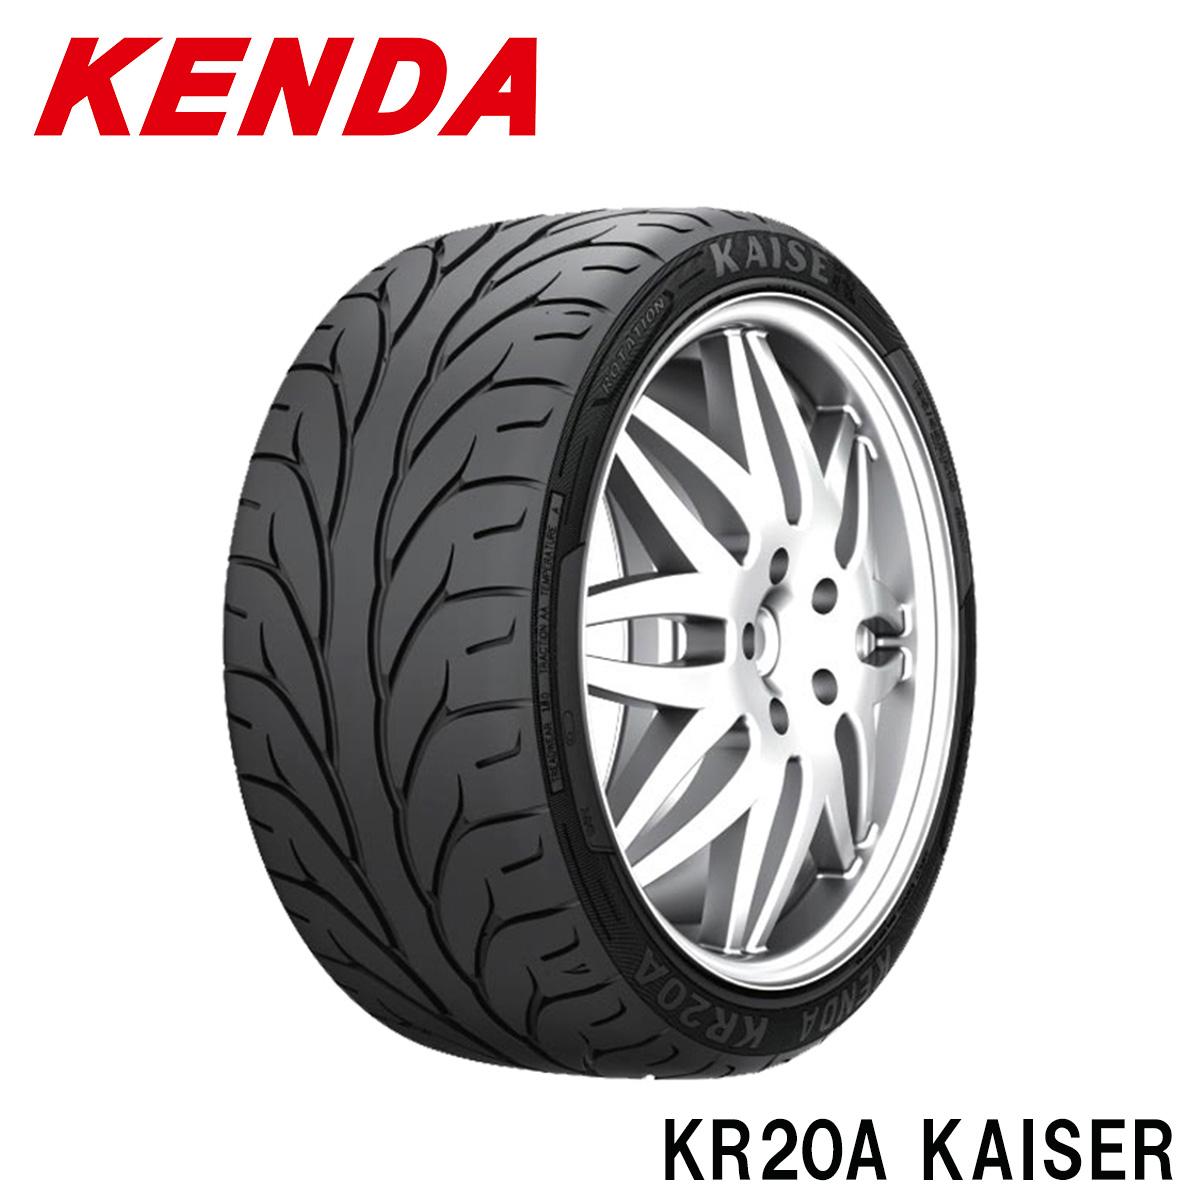 KENDA ケンダ 1本 サマータイヤ 1本 カイザー 18インチ 265 KAISER/35R18 カイザー KAISER KR20A, 稲沢市:0d52a668 --- officewill.xsrv.jp